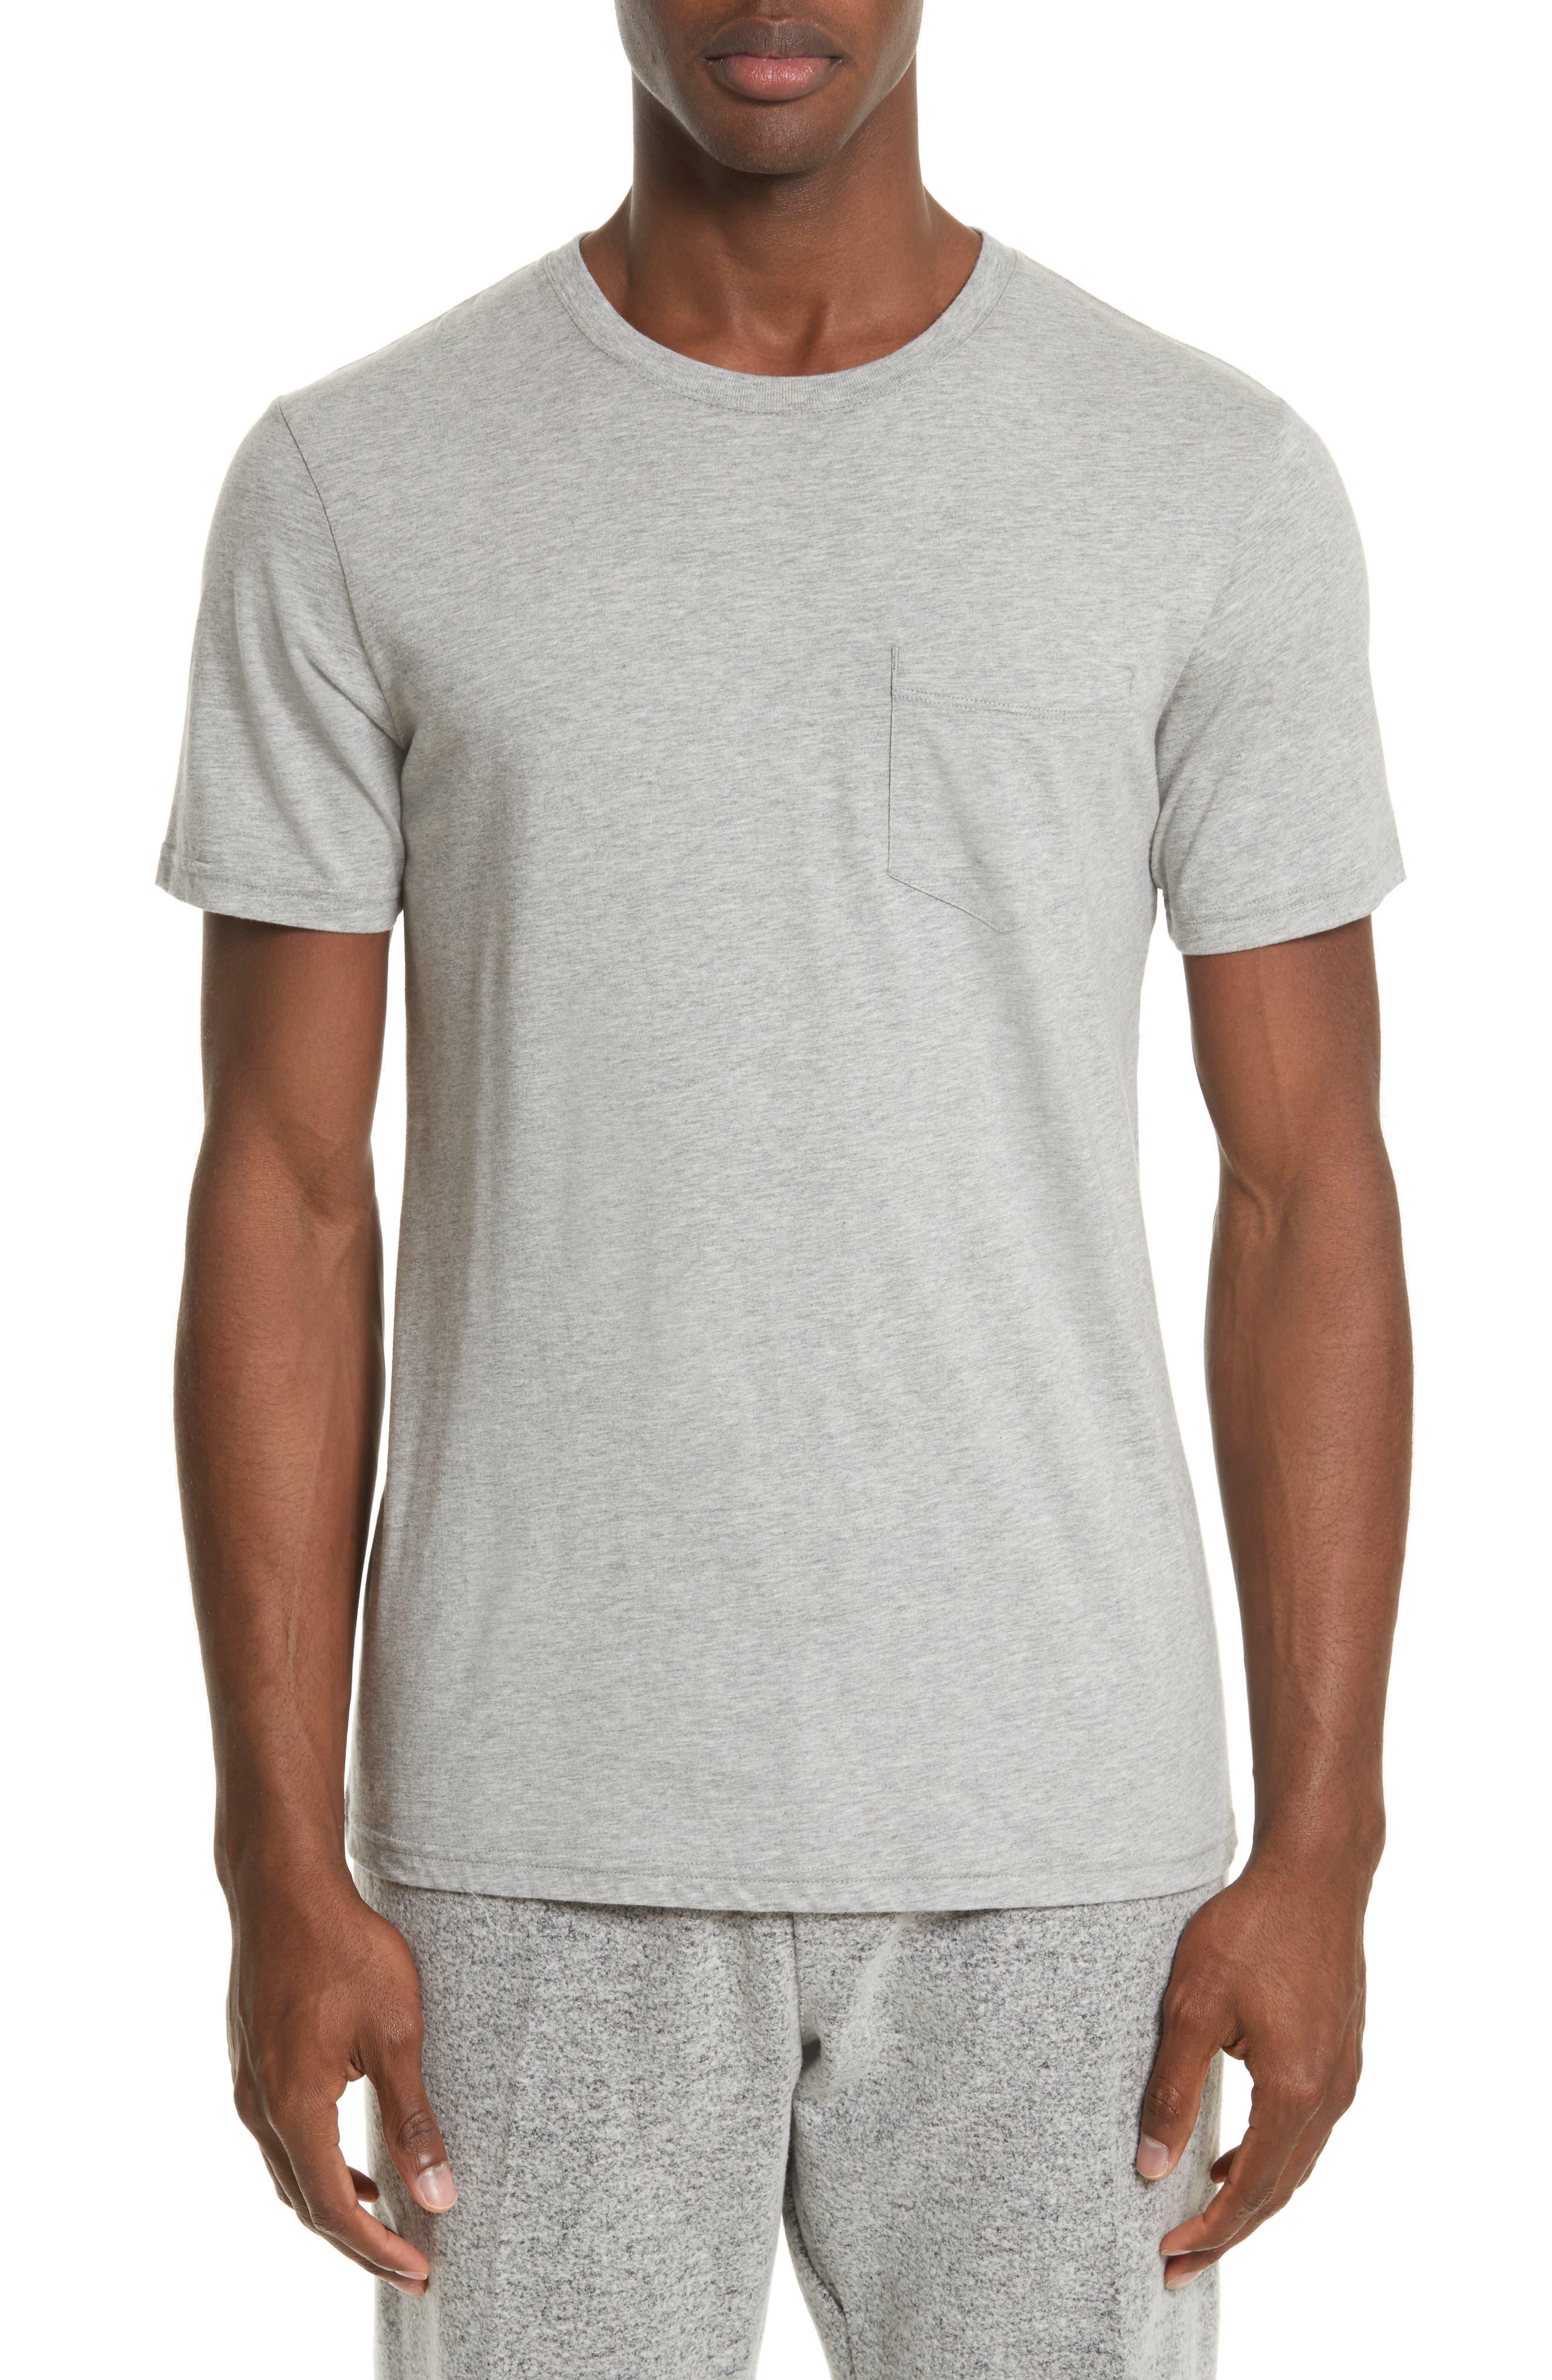 Main Image - wings + horns Original Pocket T-Shirt